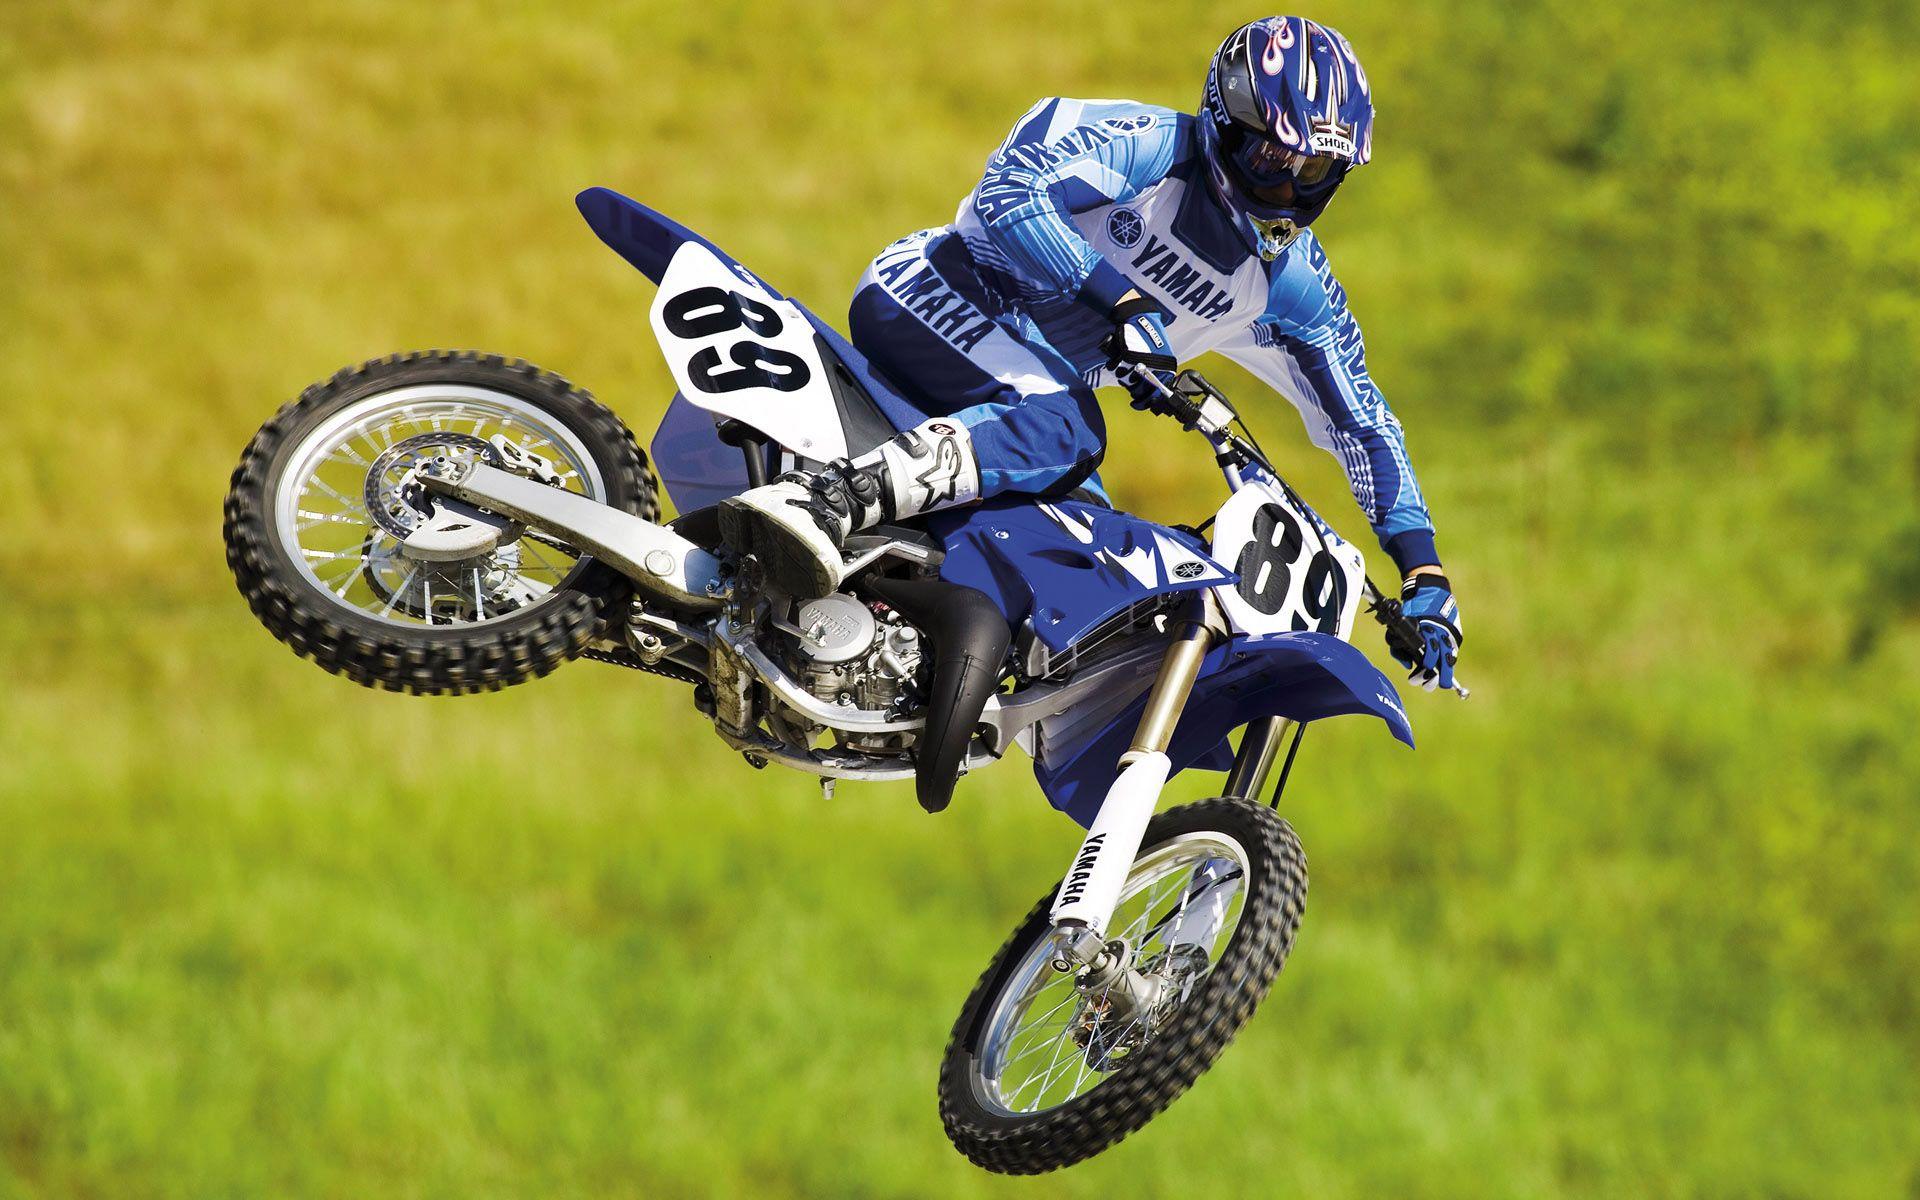 suzuki motocross bike hd - photo #41